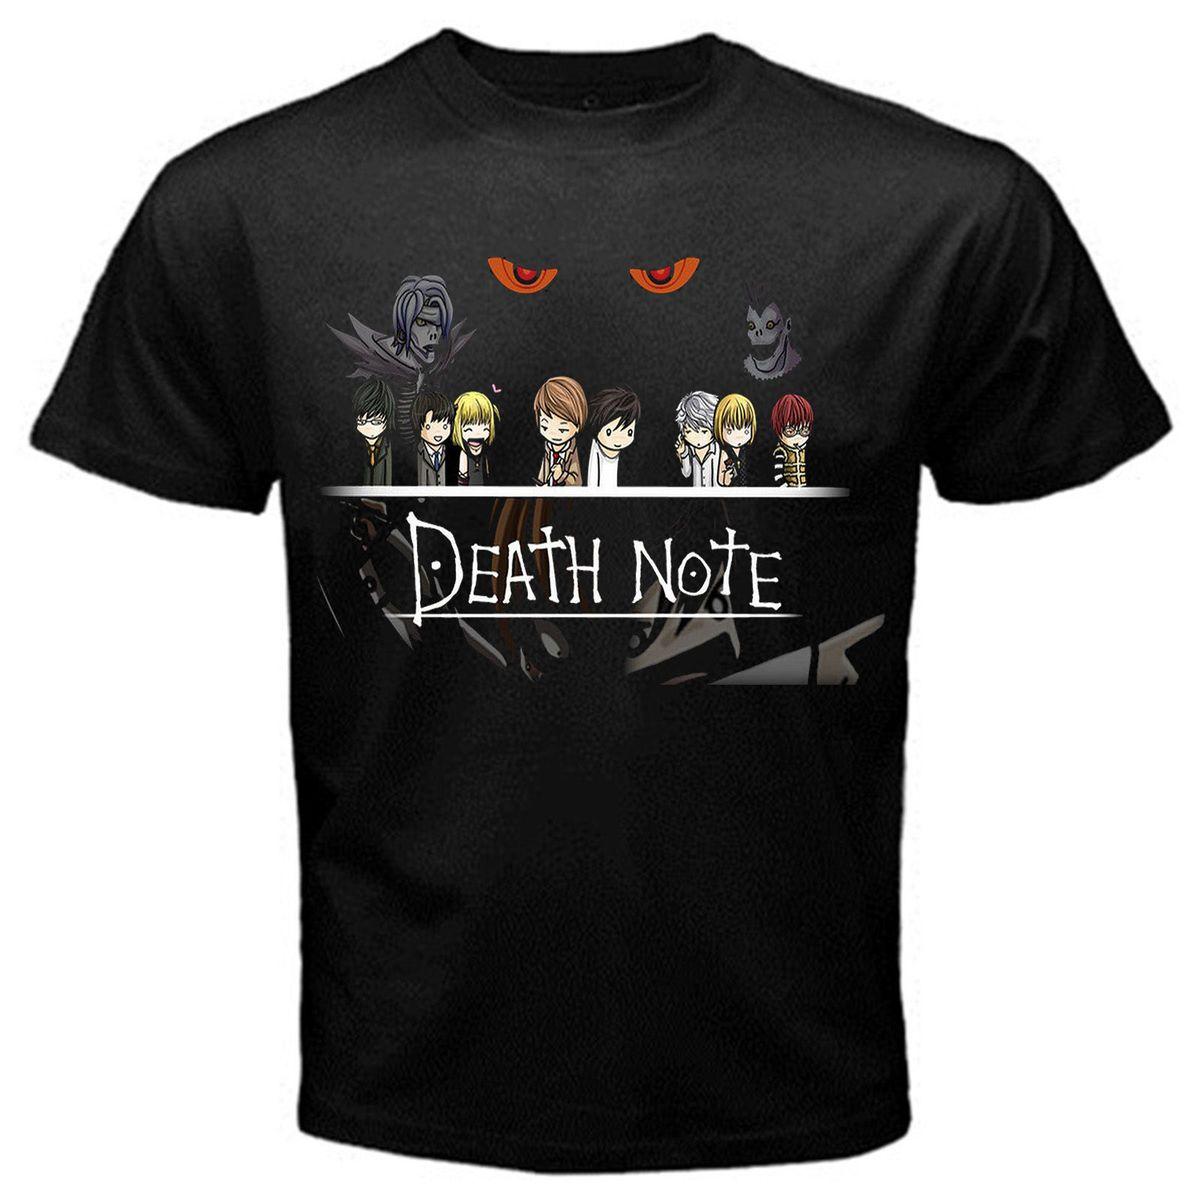 Print Tee Shirt Mens Custom Cotton Short Sleeve Light Yagami Death Note Team Clothes Men T-shirt Tops & Tees